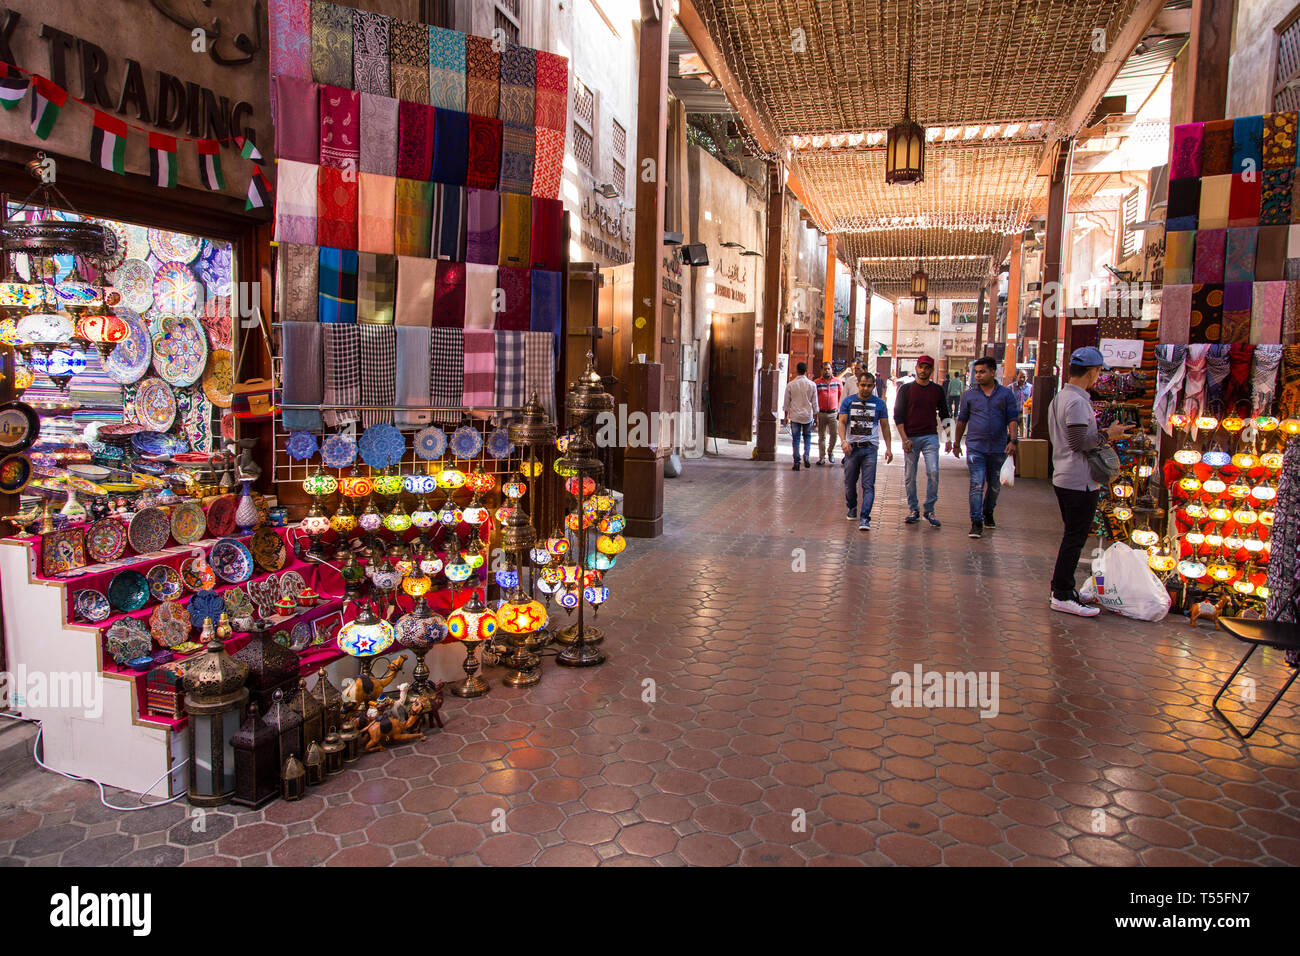 UAE, Dubai, Deira Old Town, Gold and Spice Souq Stock Photo